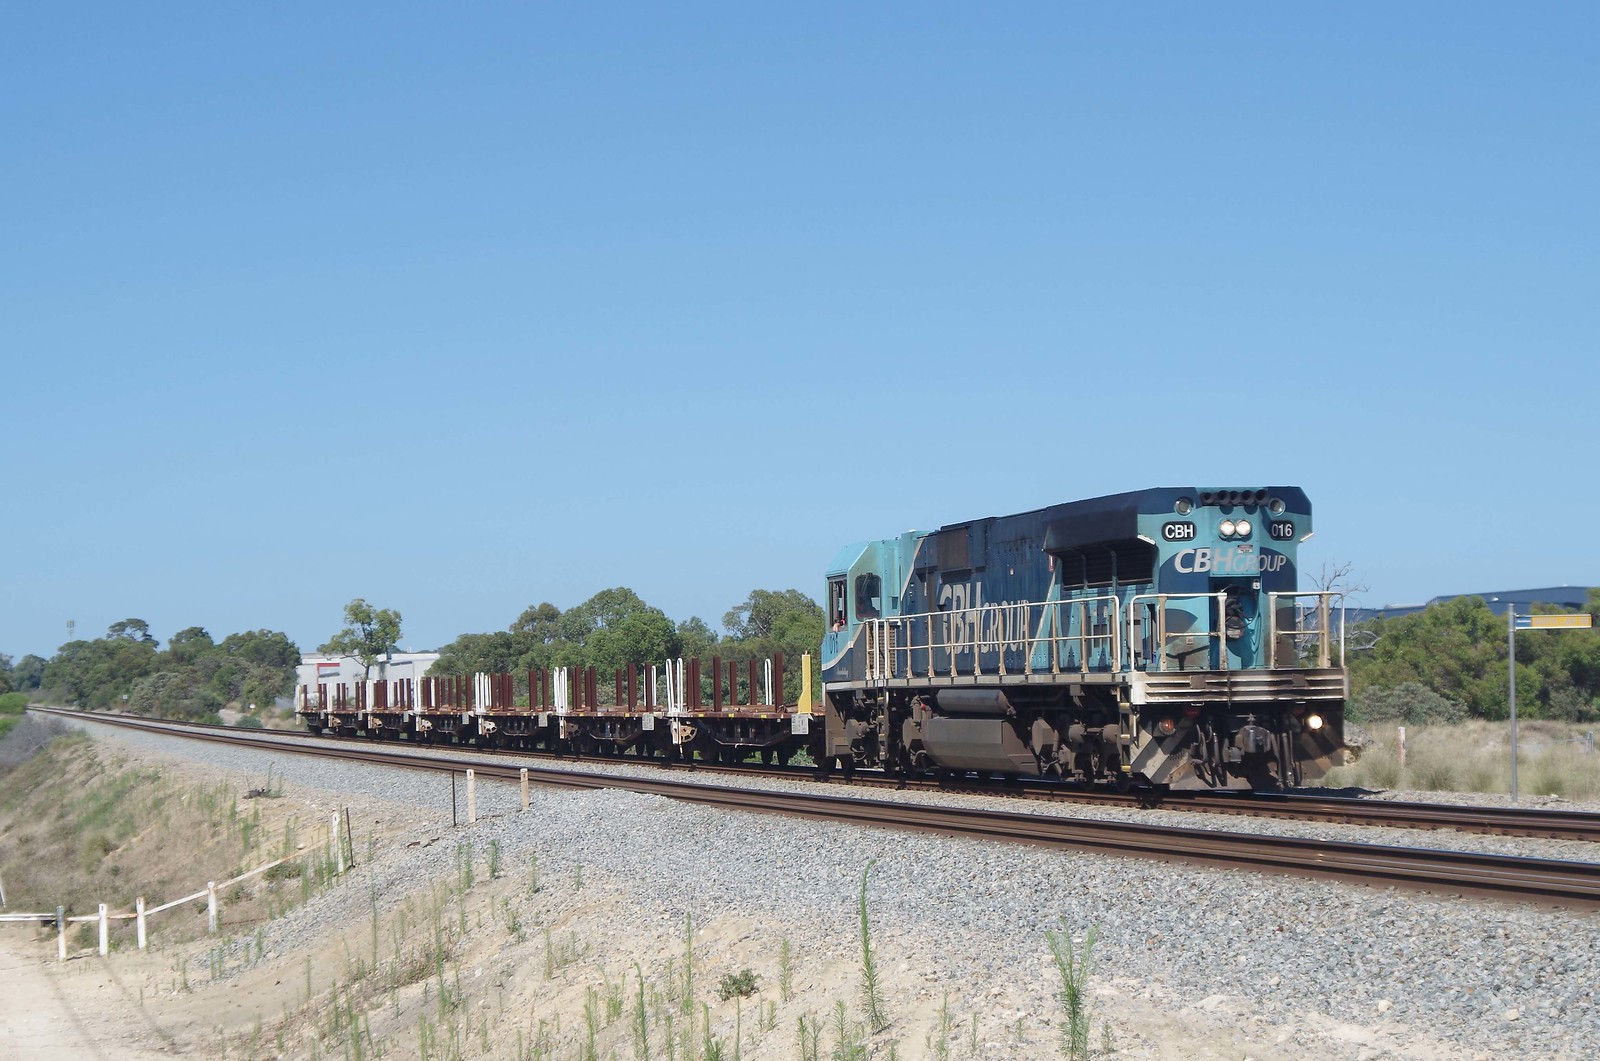 A cargo train has derailed after crashing into a car at a rail